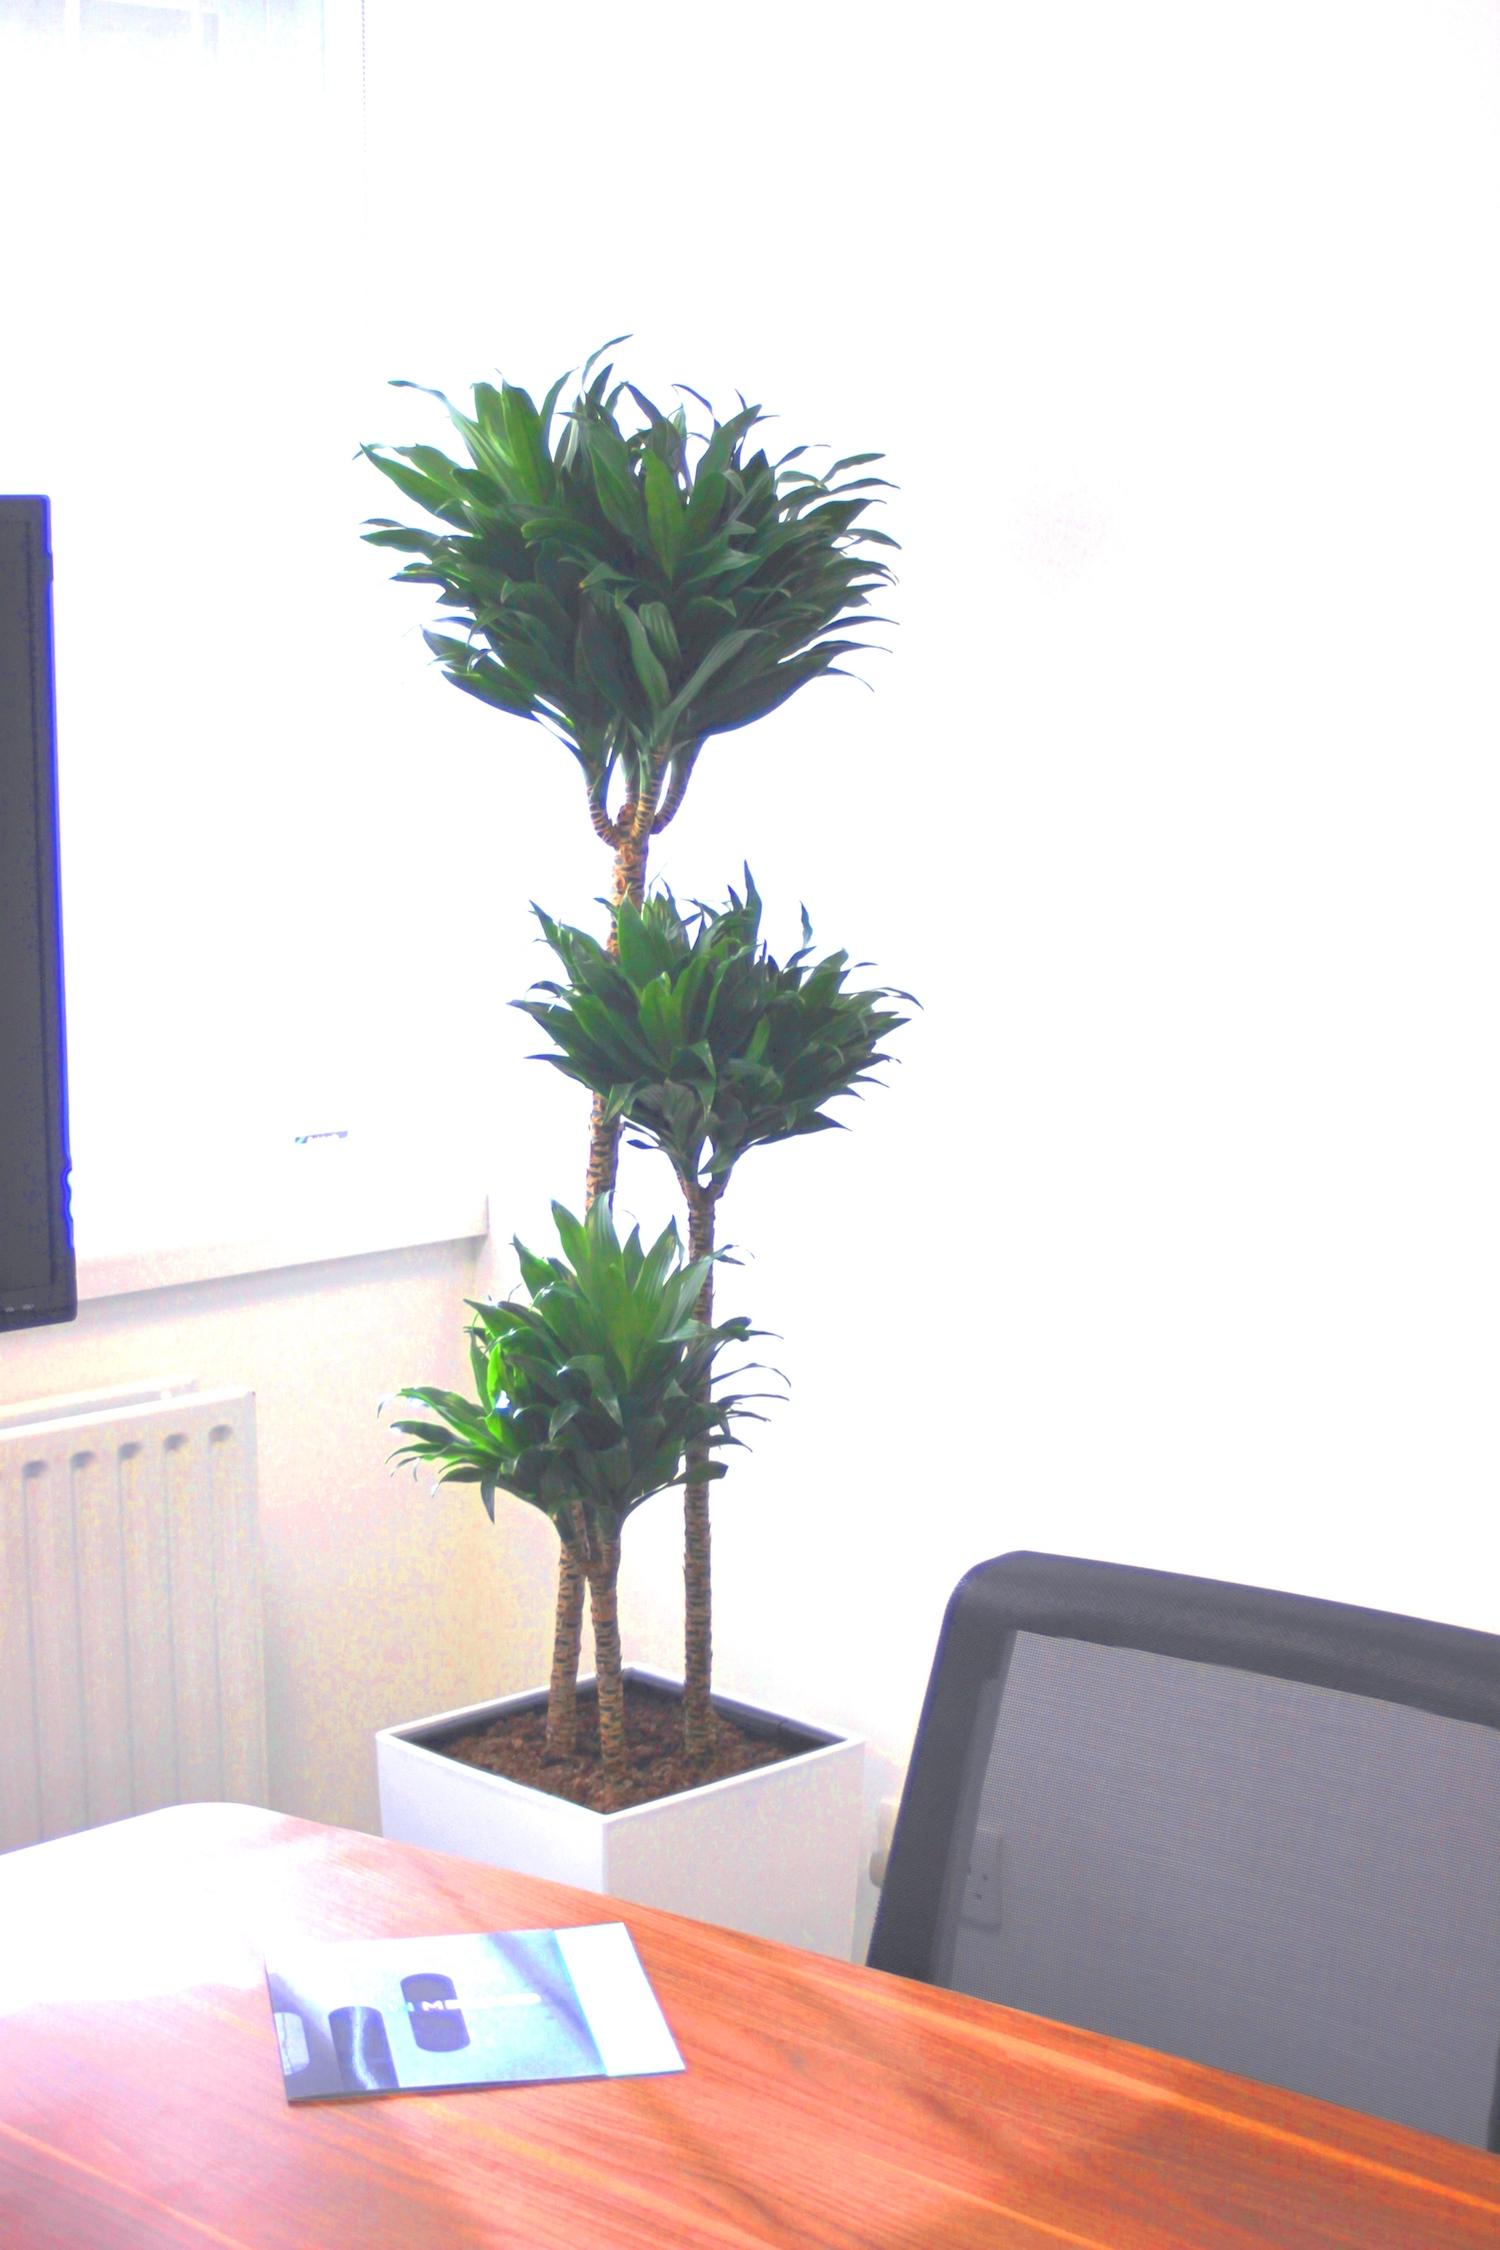 medaco-plantcare-interior-plants-trees-bristol-image-4